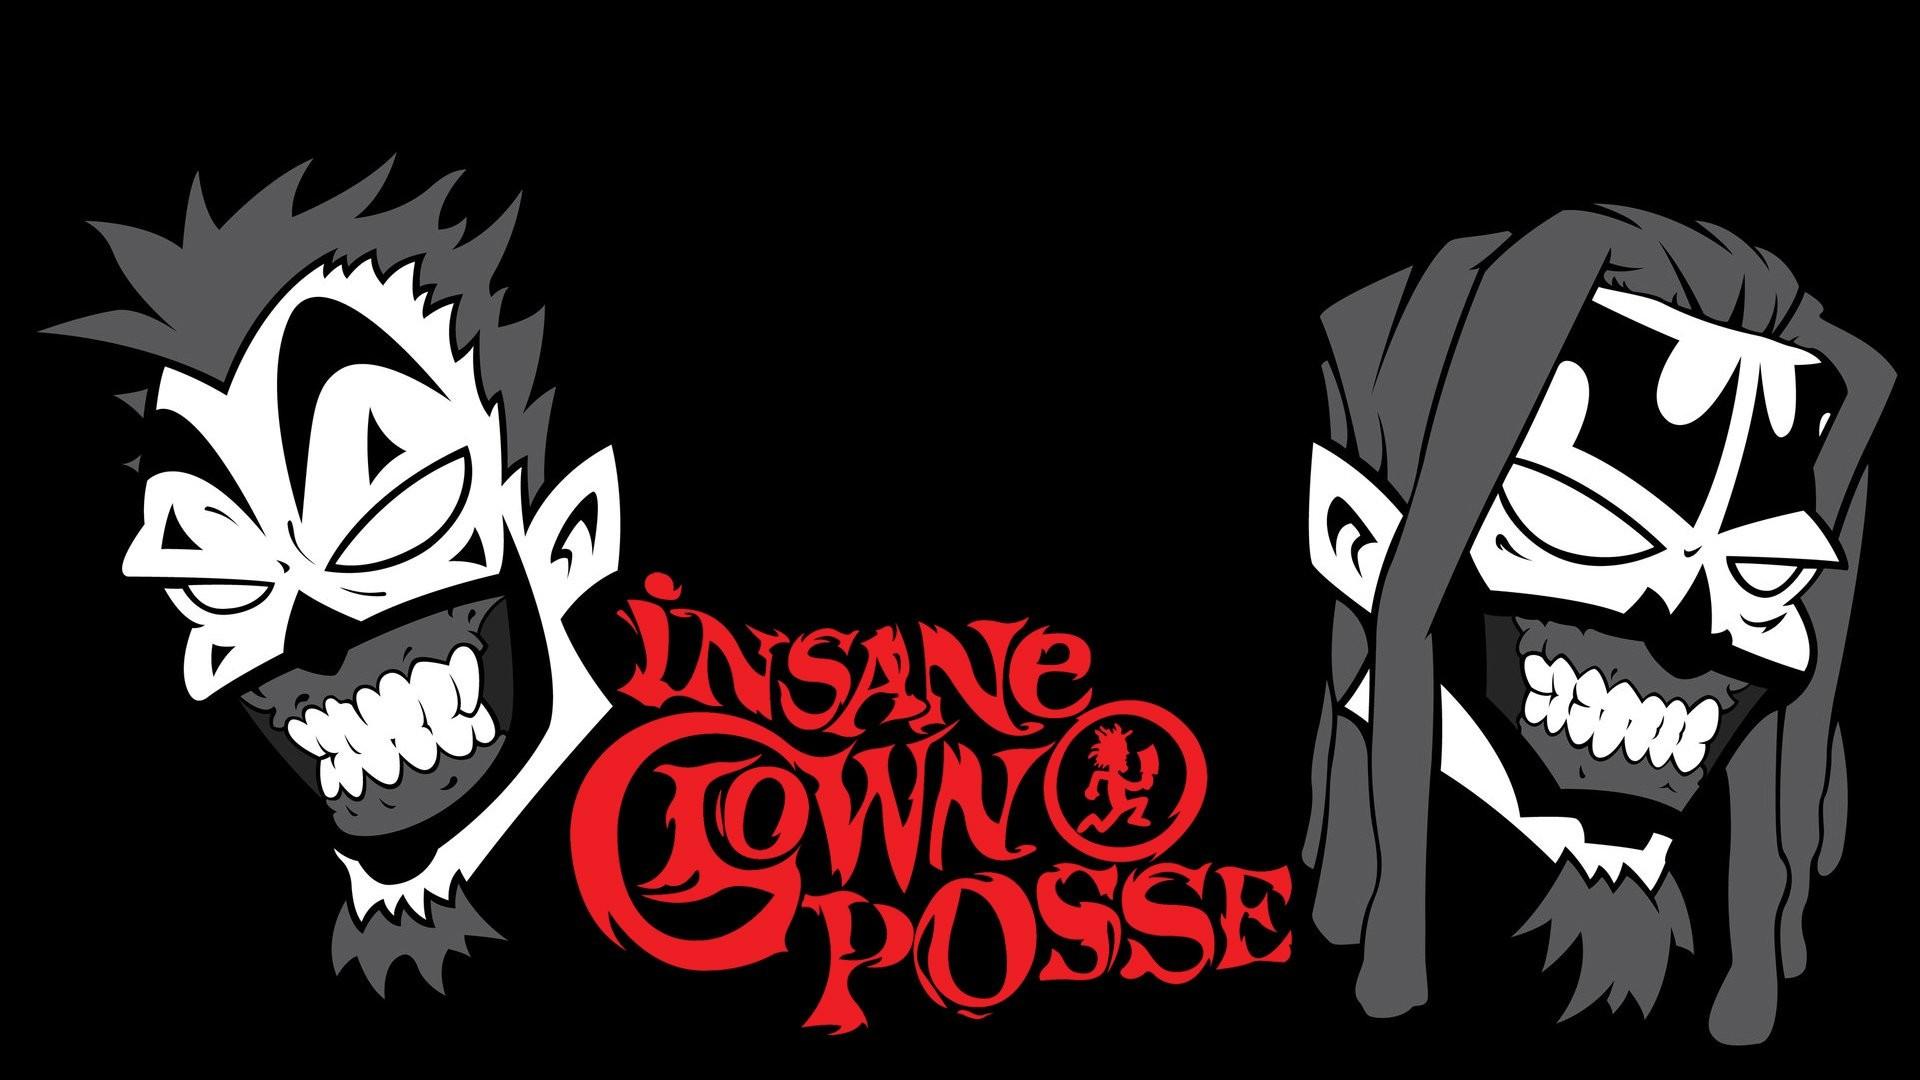 icp juggalo rap rapper hip hop comedy horrorcore hardcore wallpaper .